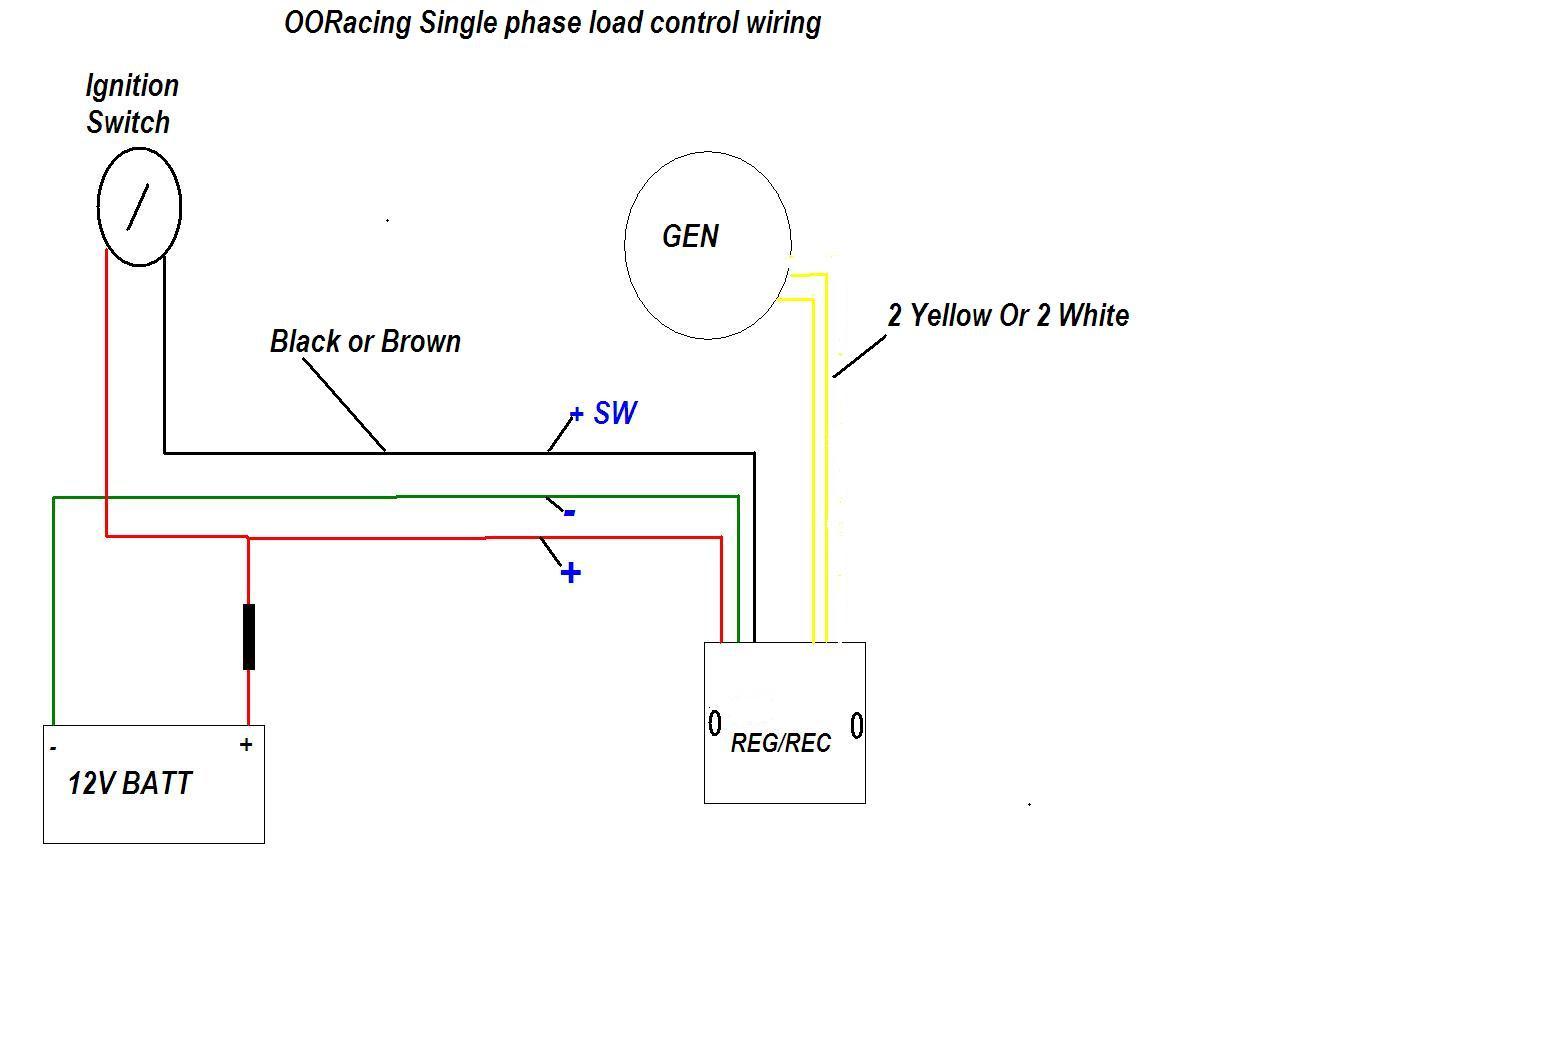 Diagram Honda Crf50 Wiring Diagram Full Version Hd Quality Wiring Diagram Mayswiring Prolocomontefano It